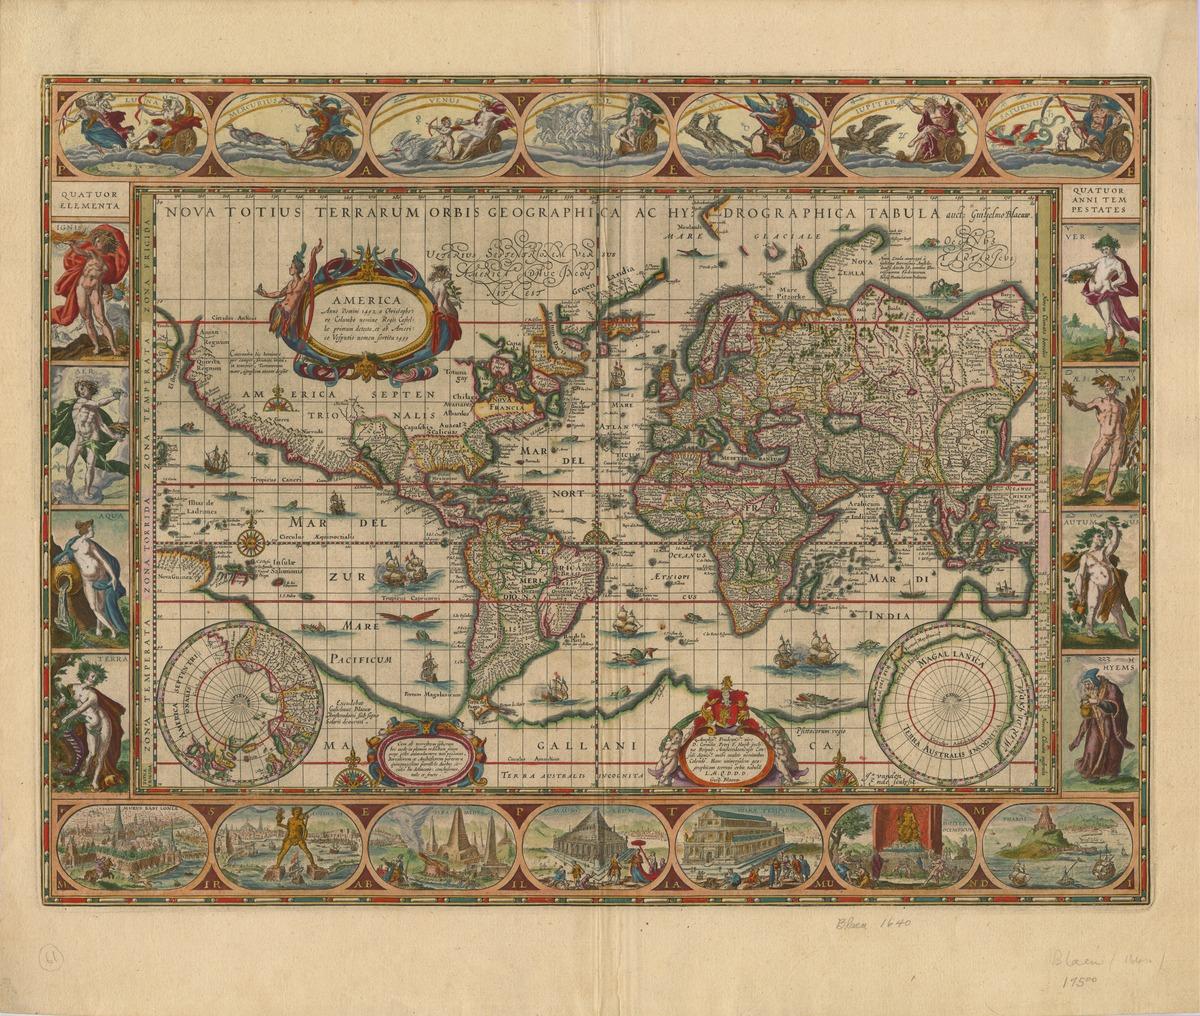 Nova totius terrarum orbis geographica ac hydrographica tabula, auct: Guiljelmo Blaeuw